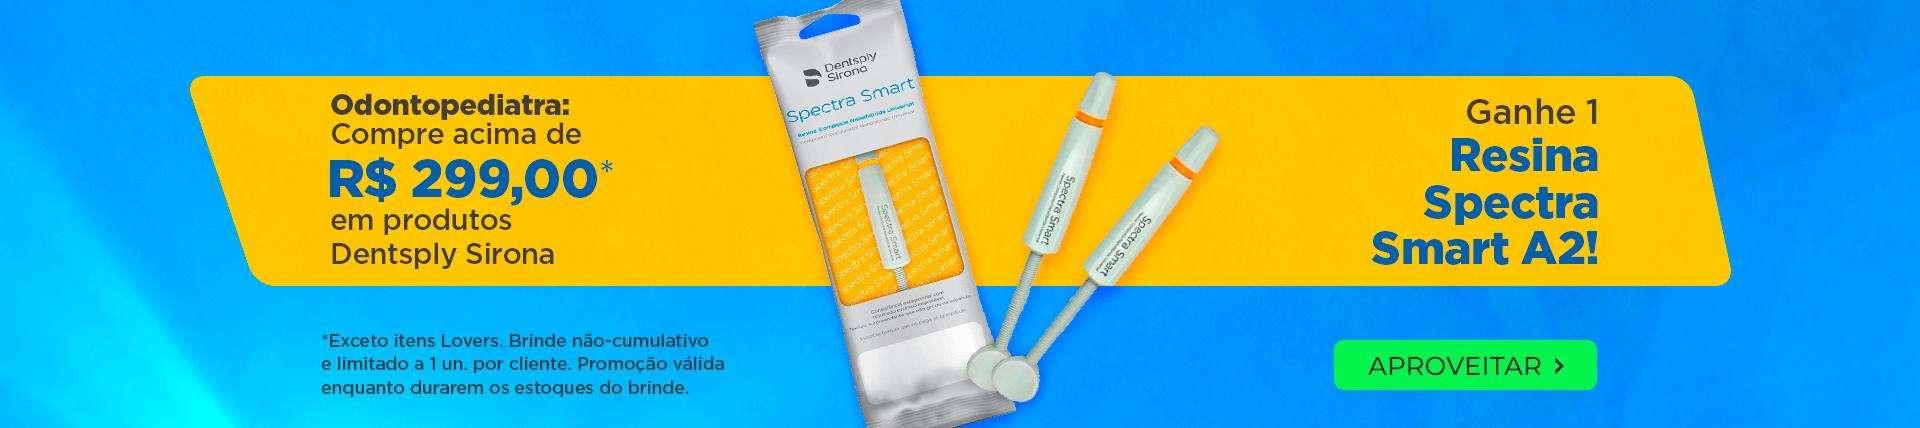 Odontopediatra ganhe de brinde resina Spectra Smart A2   Dental Cremer